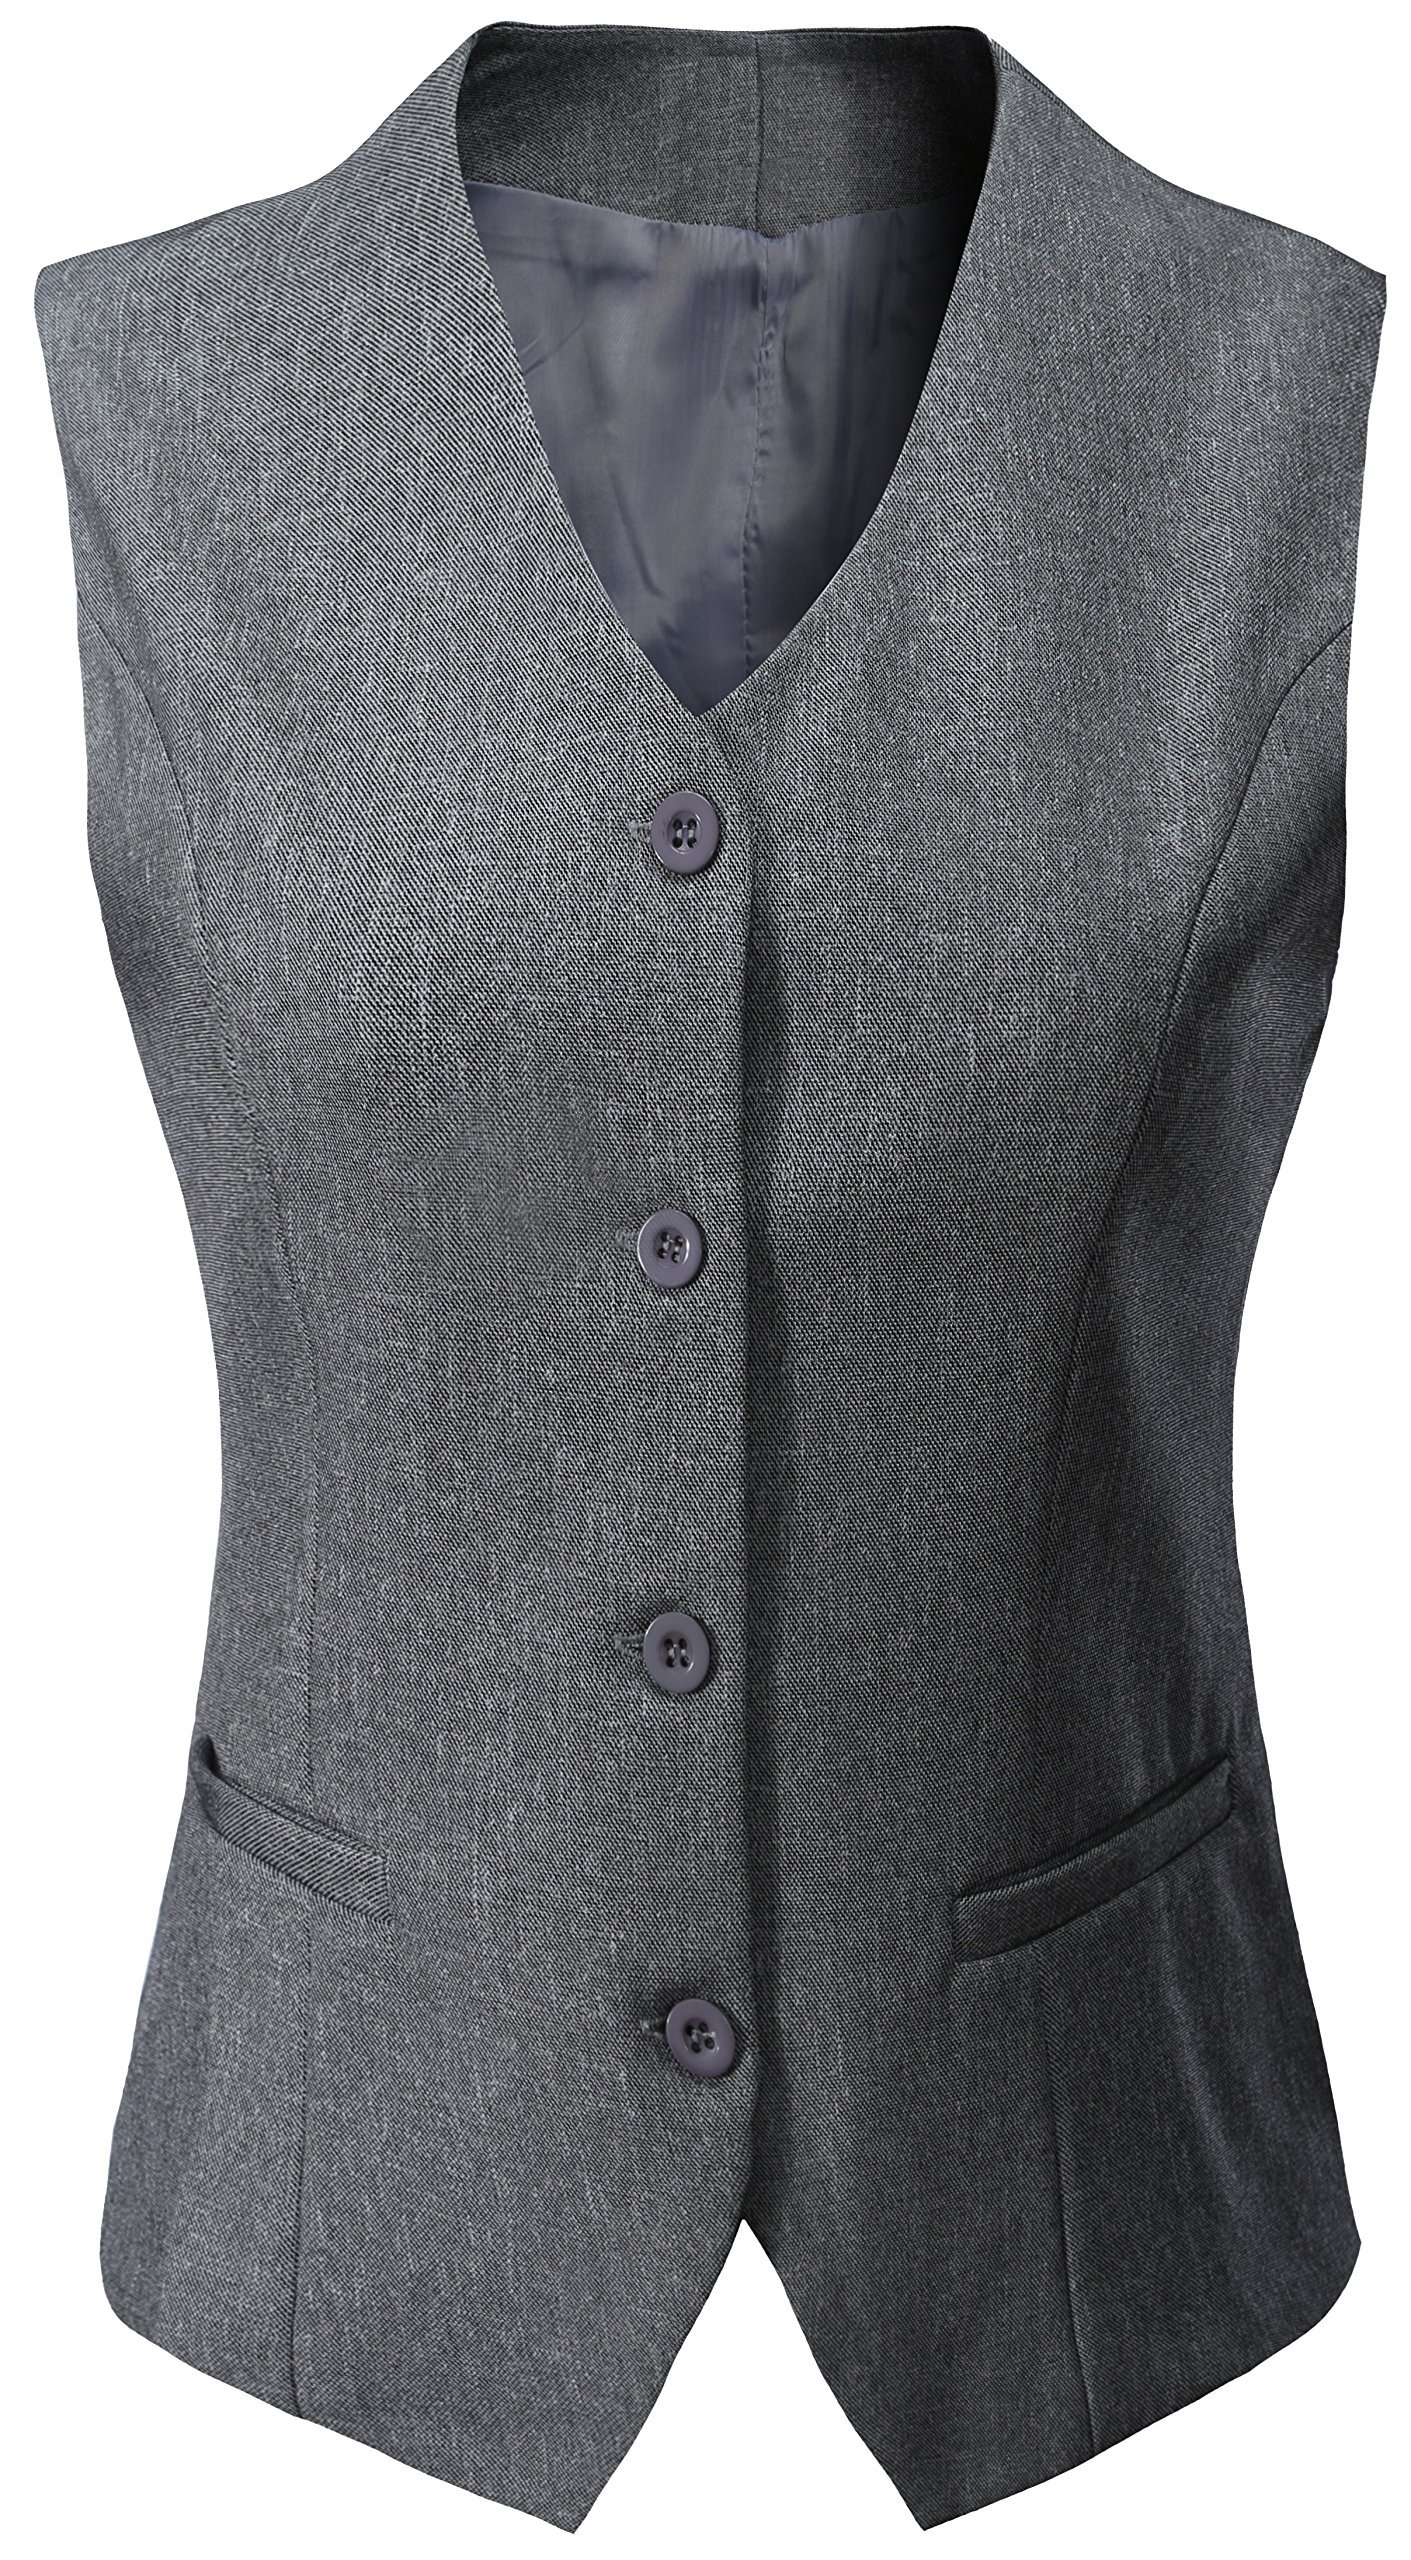 Vocni Women's Fully Lined 4 Button V-Neck Economy Dressy Suit Vest Waistcoat,Light Gray,US M/Asia 3XL